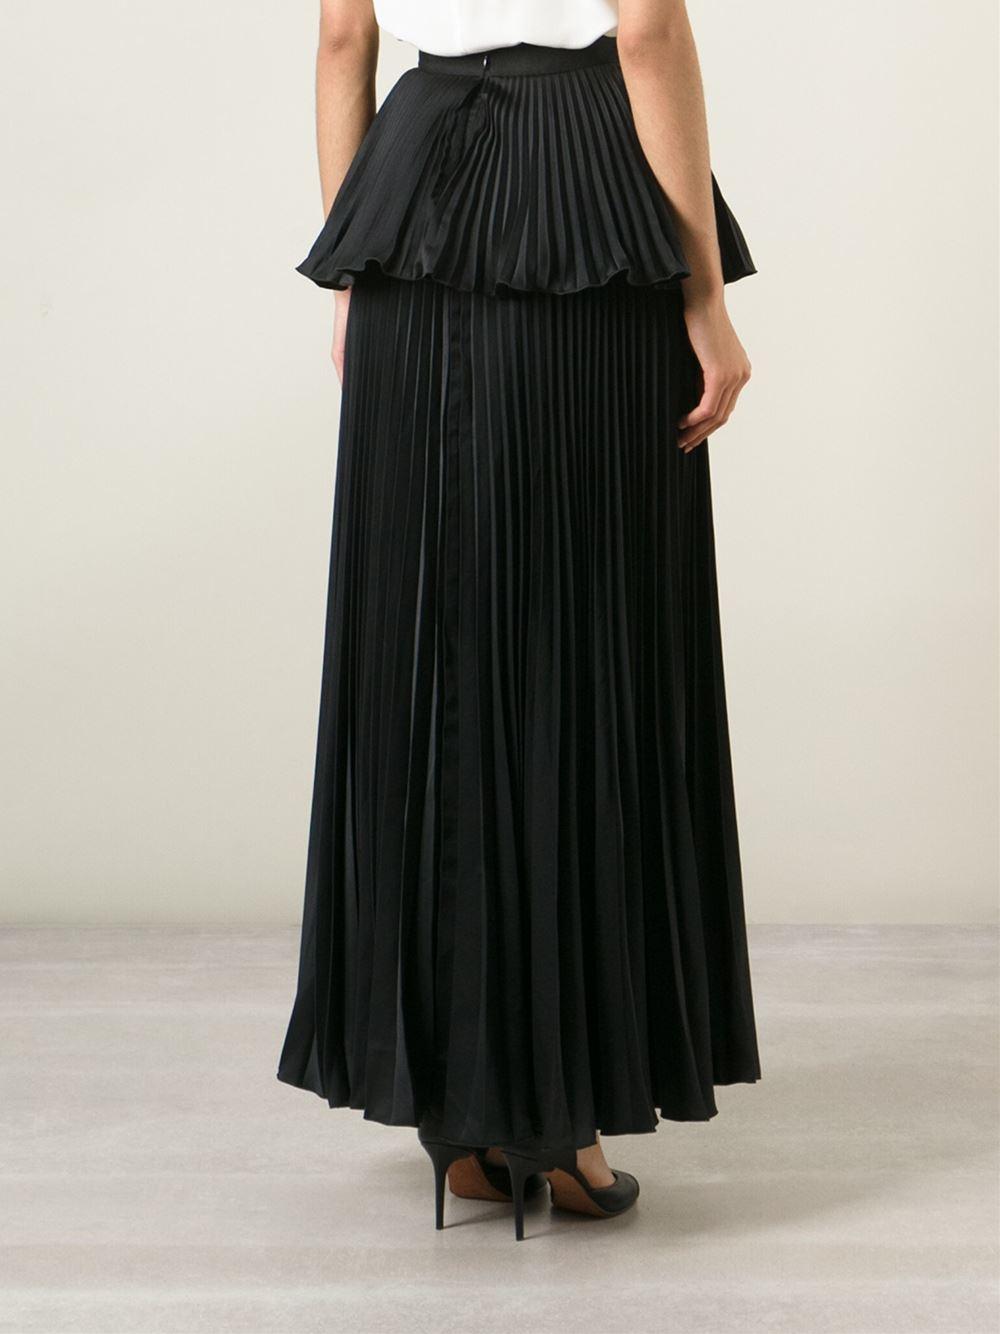 Issa Long Pleated Peplum Skirt In Black Lyst